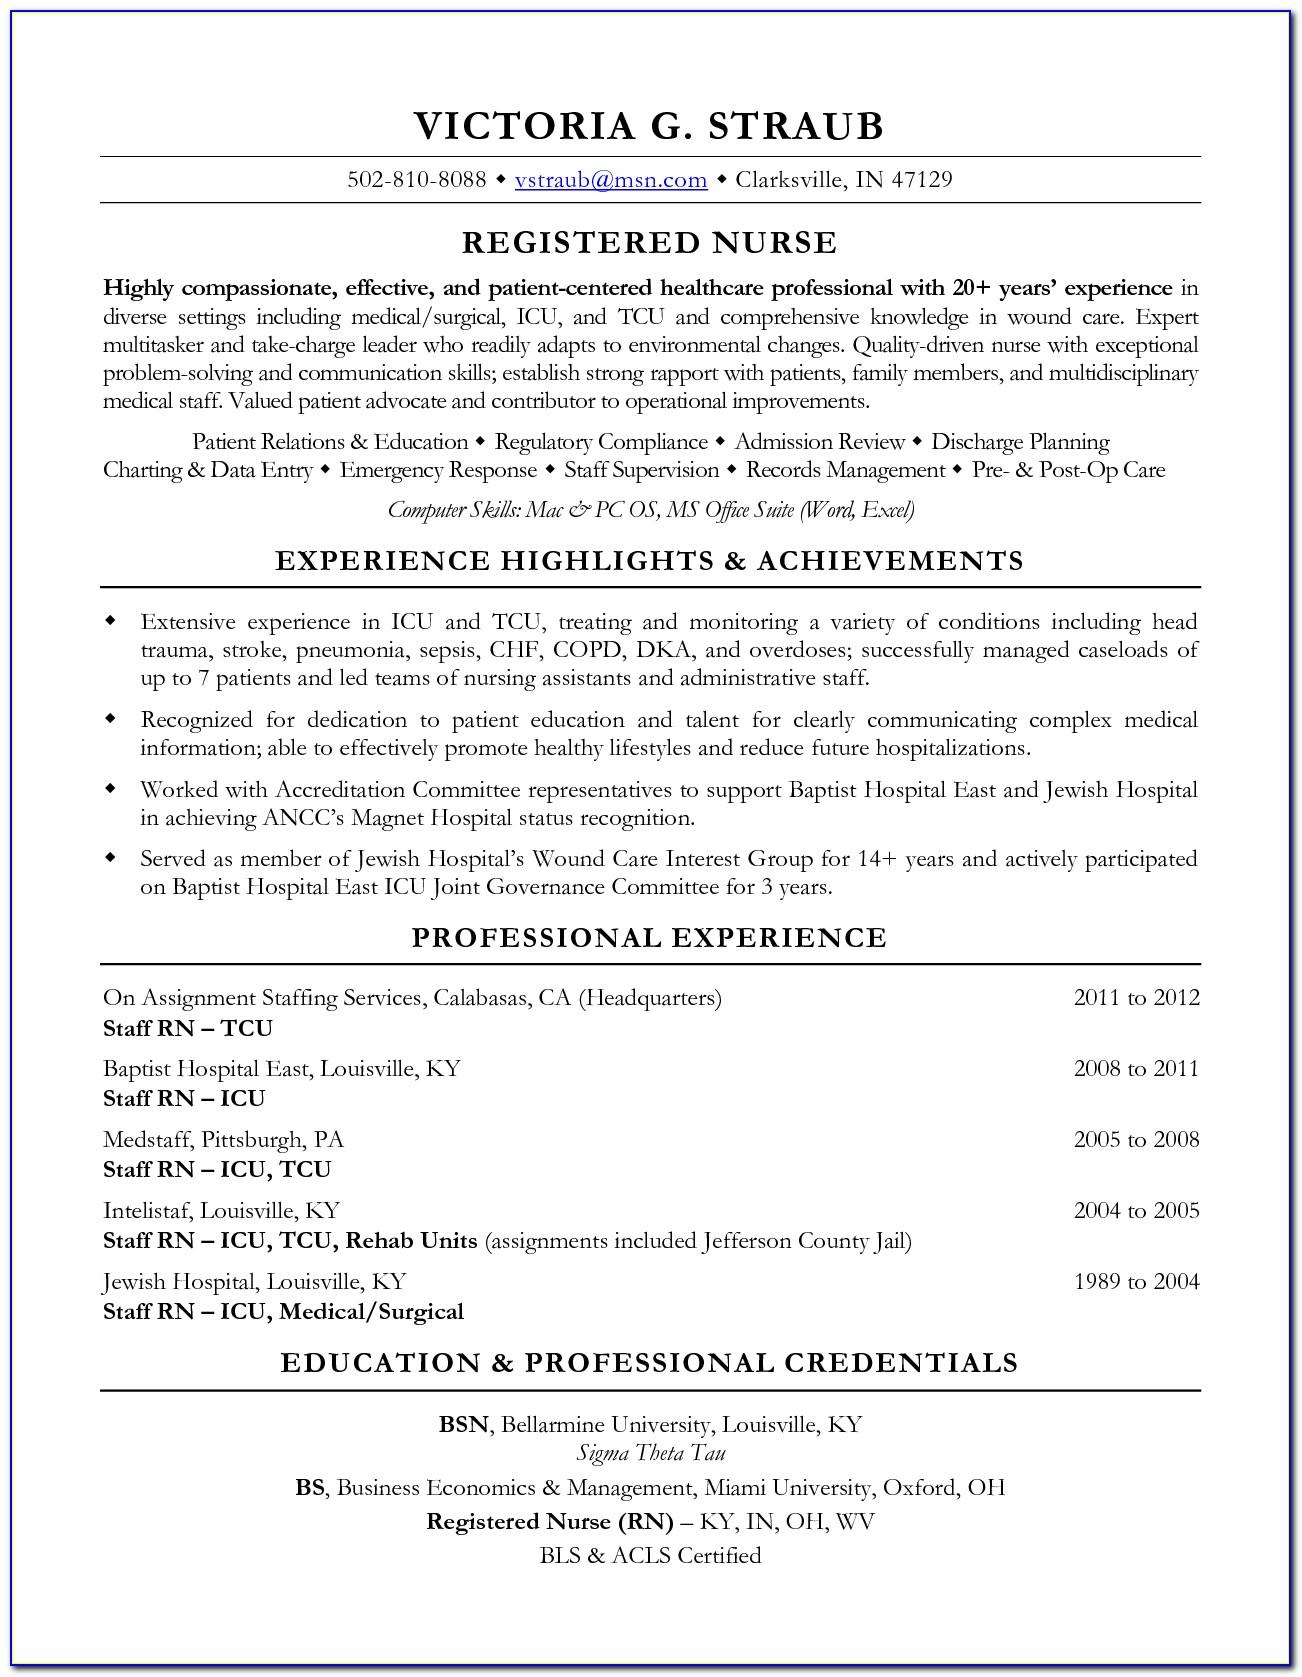 Resume Sample For Nurses Fresh Graduate